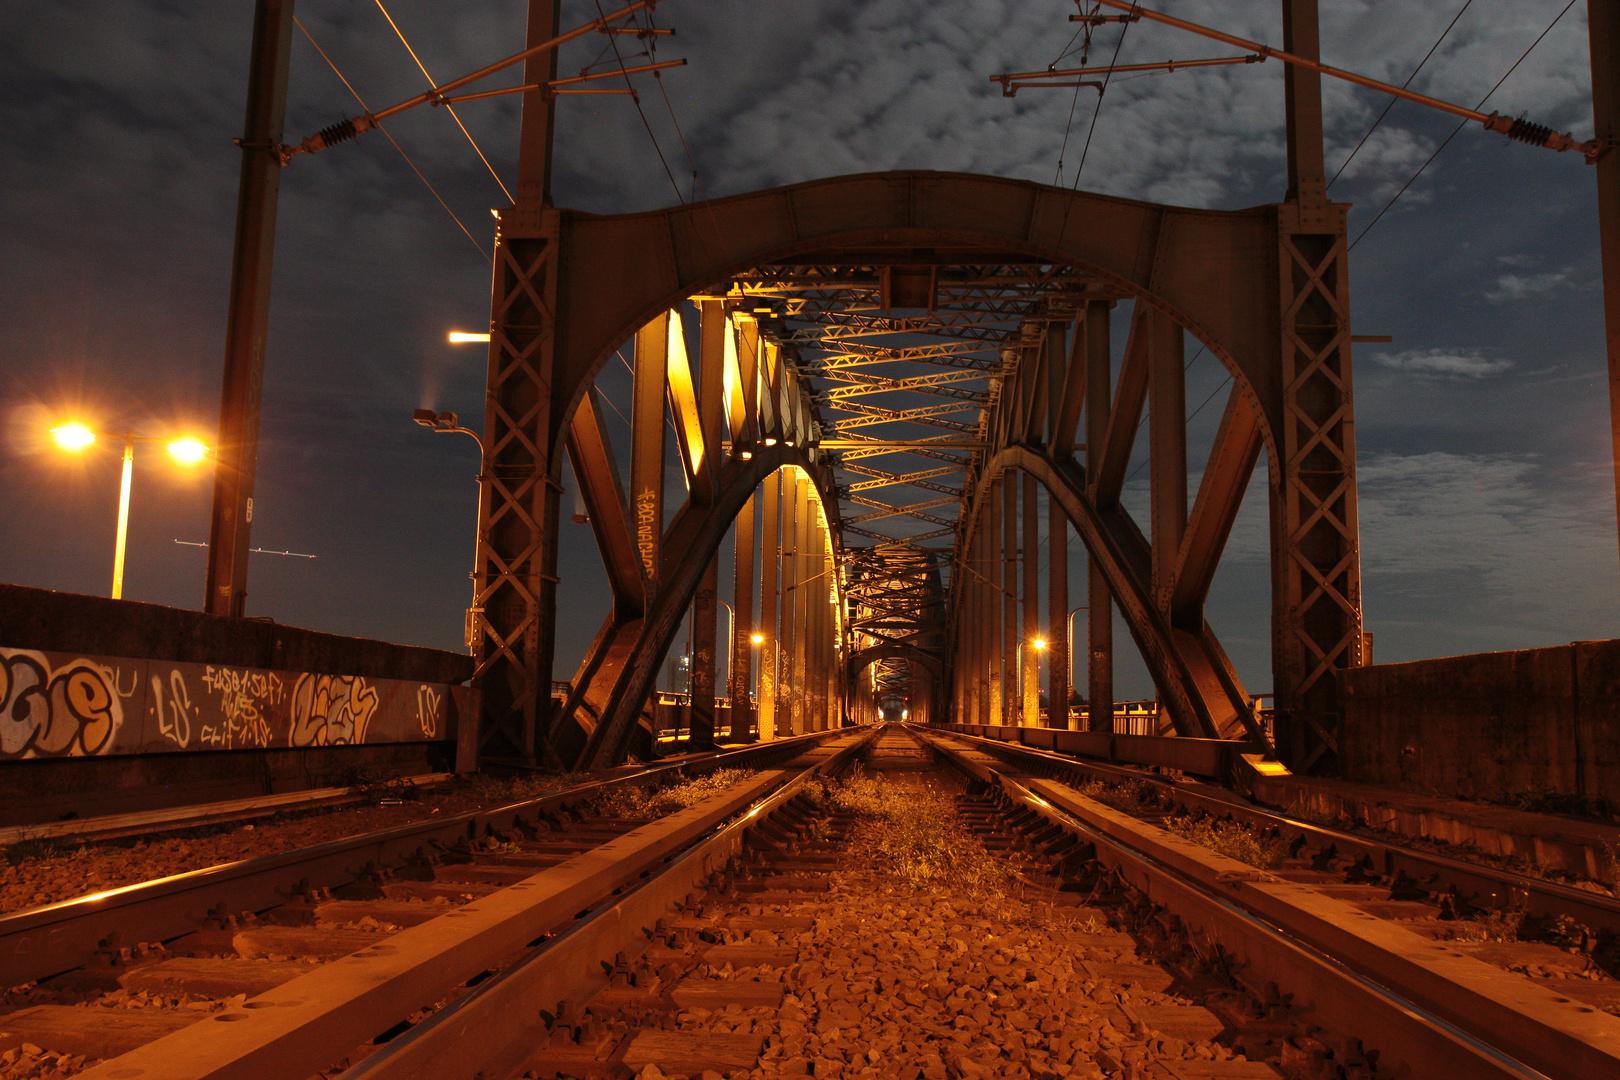 Südbrücke Köln bei Vollmond am 18.10.2013